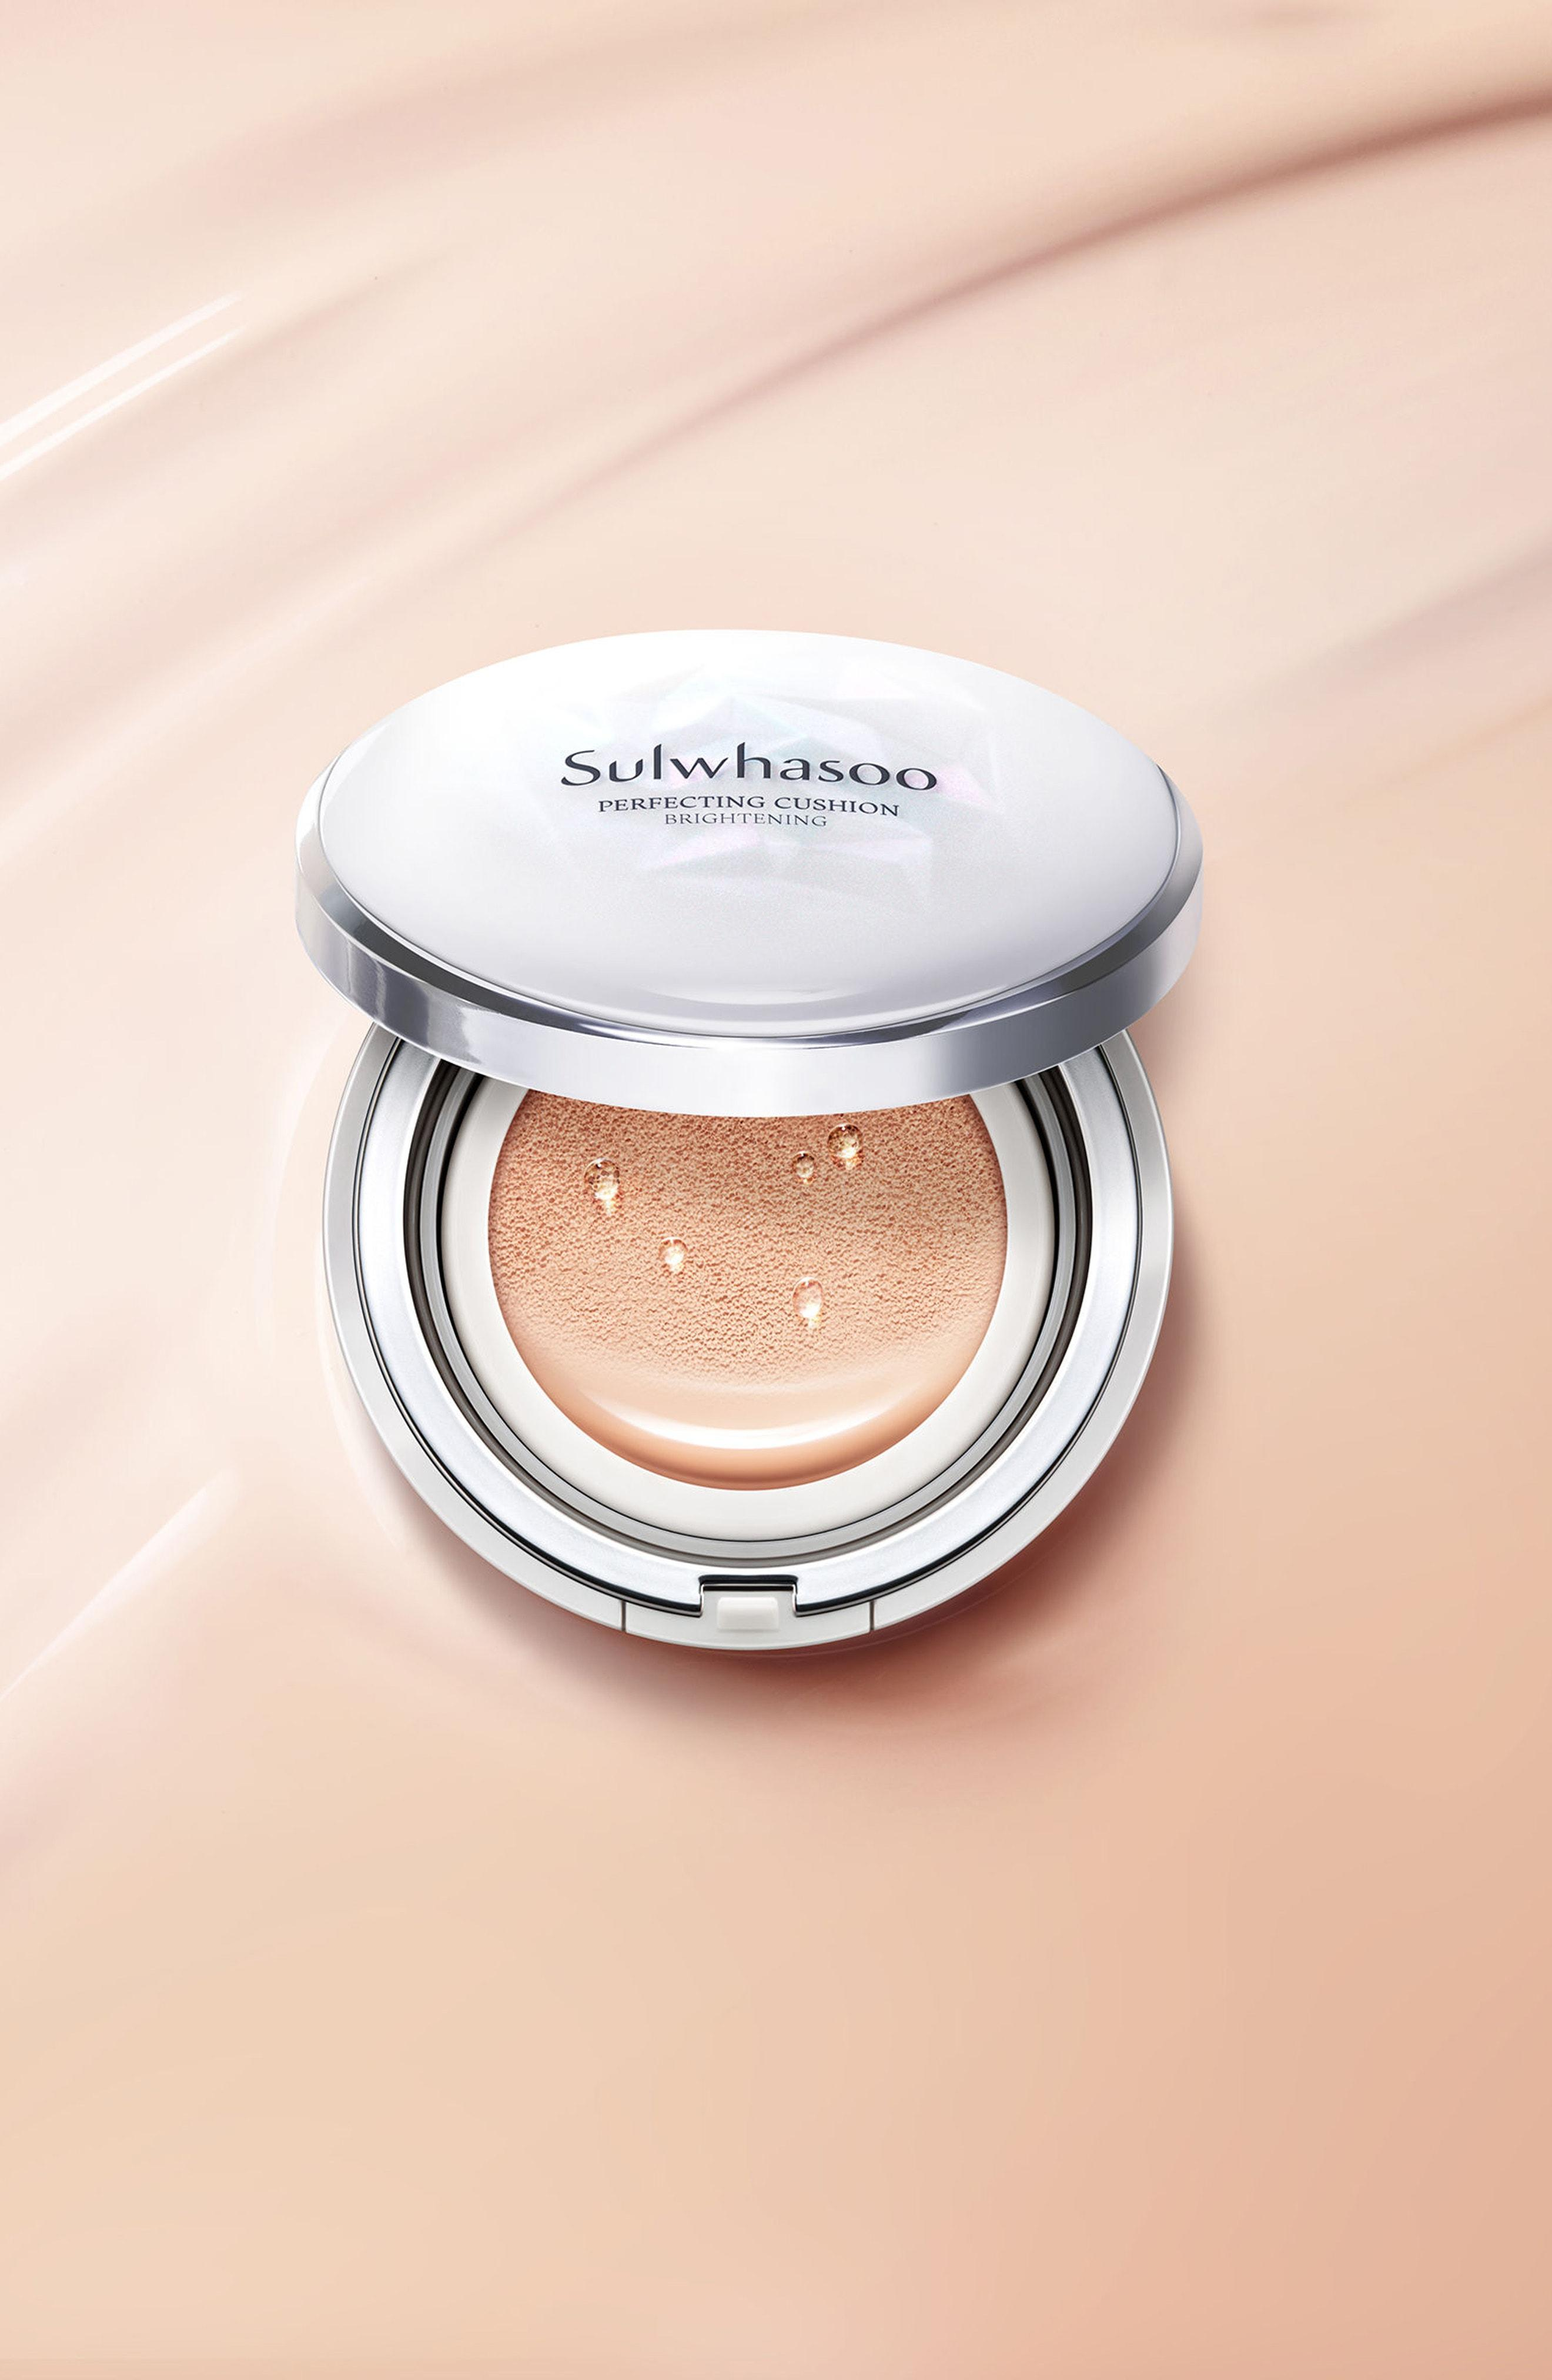 Sulwhasoo Perfecting Cushion Brightening Foundation - 17 Light Beige